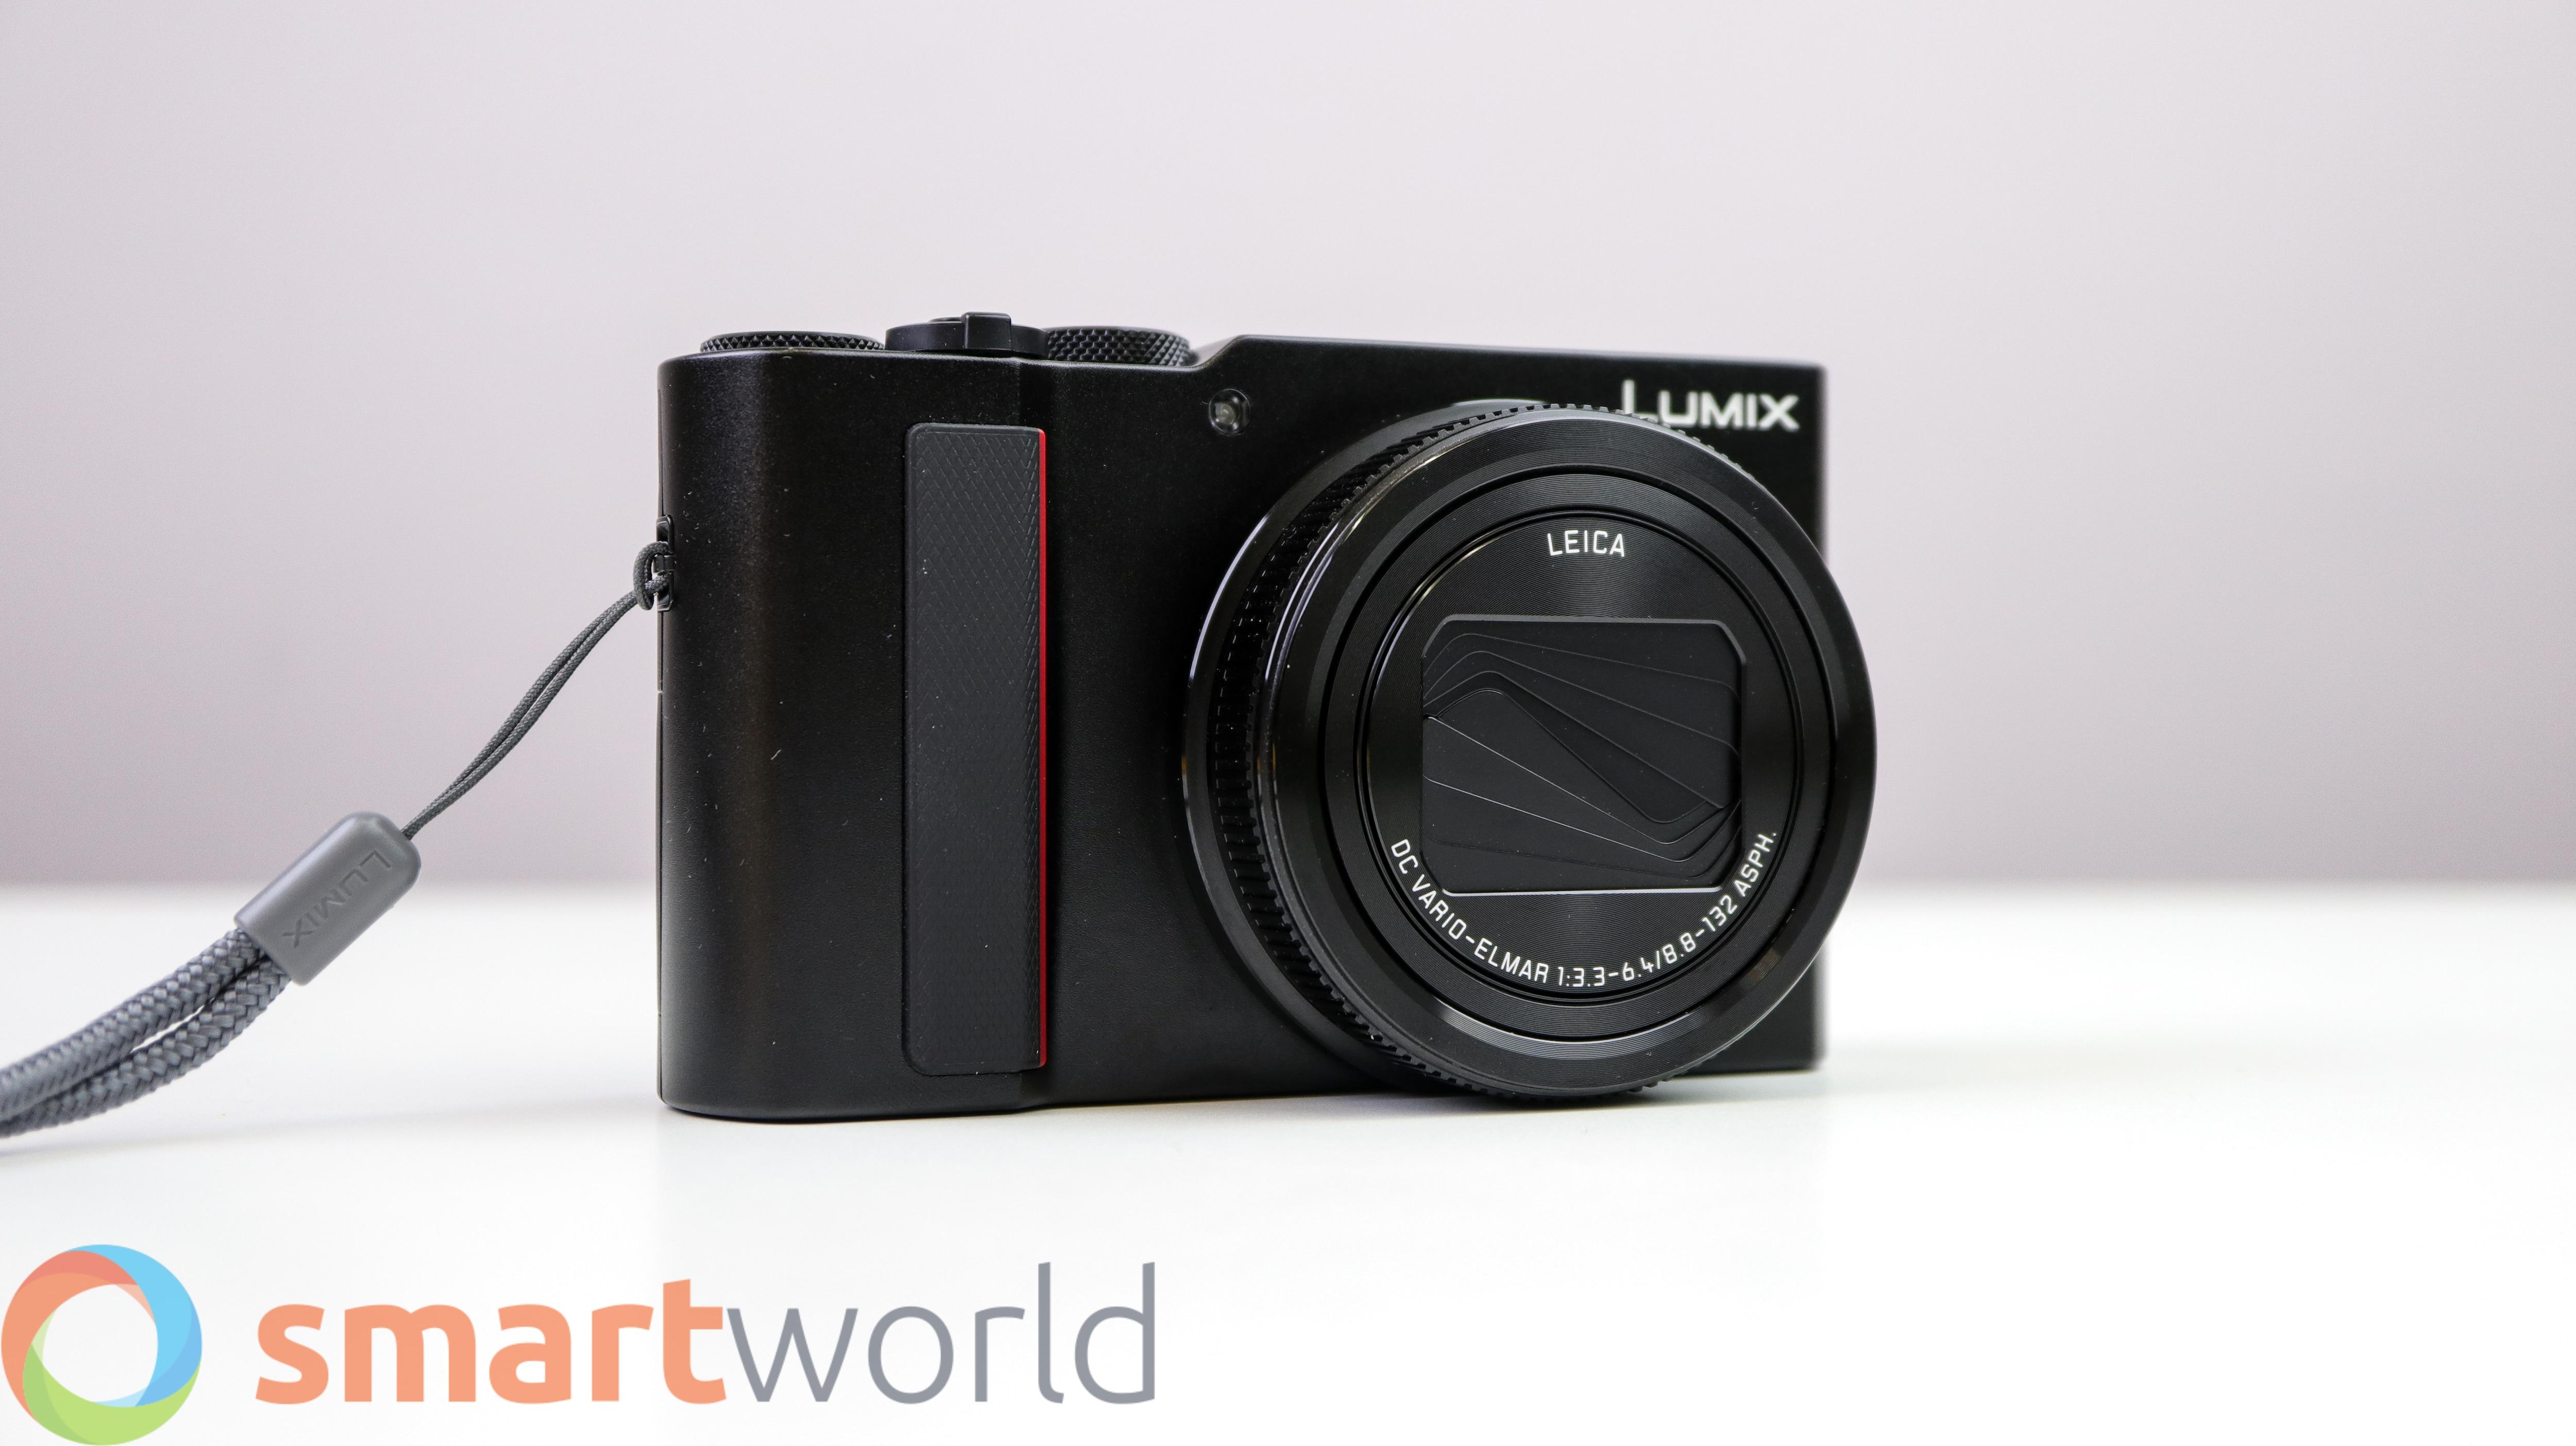 Panasonic Lumix DC-TZ200-1